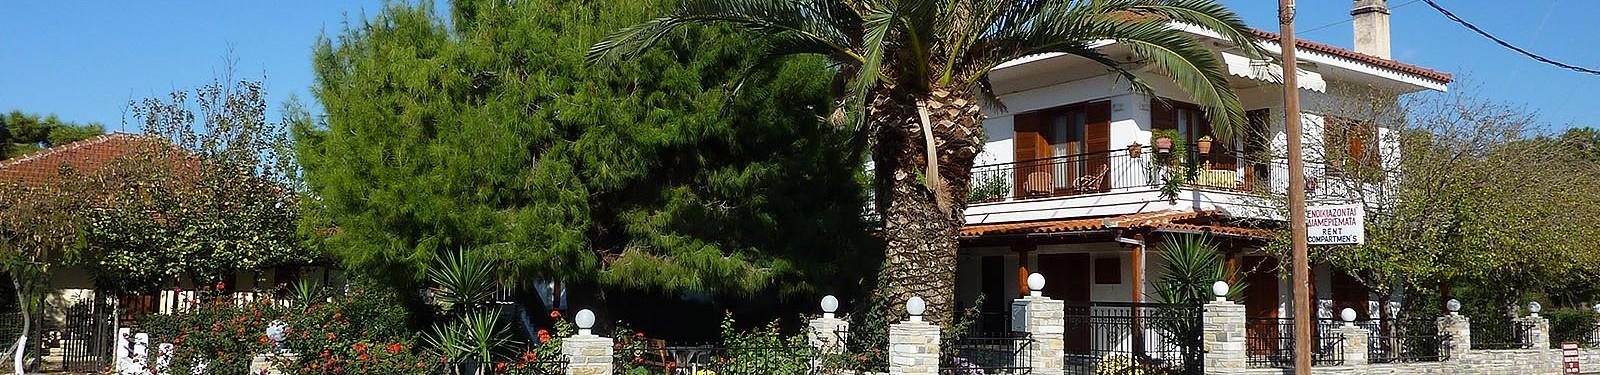 Hatzis House